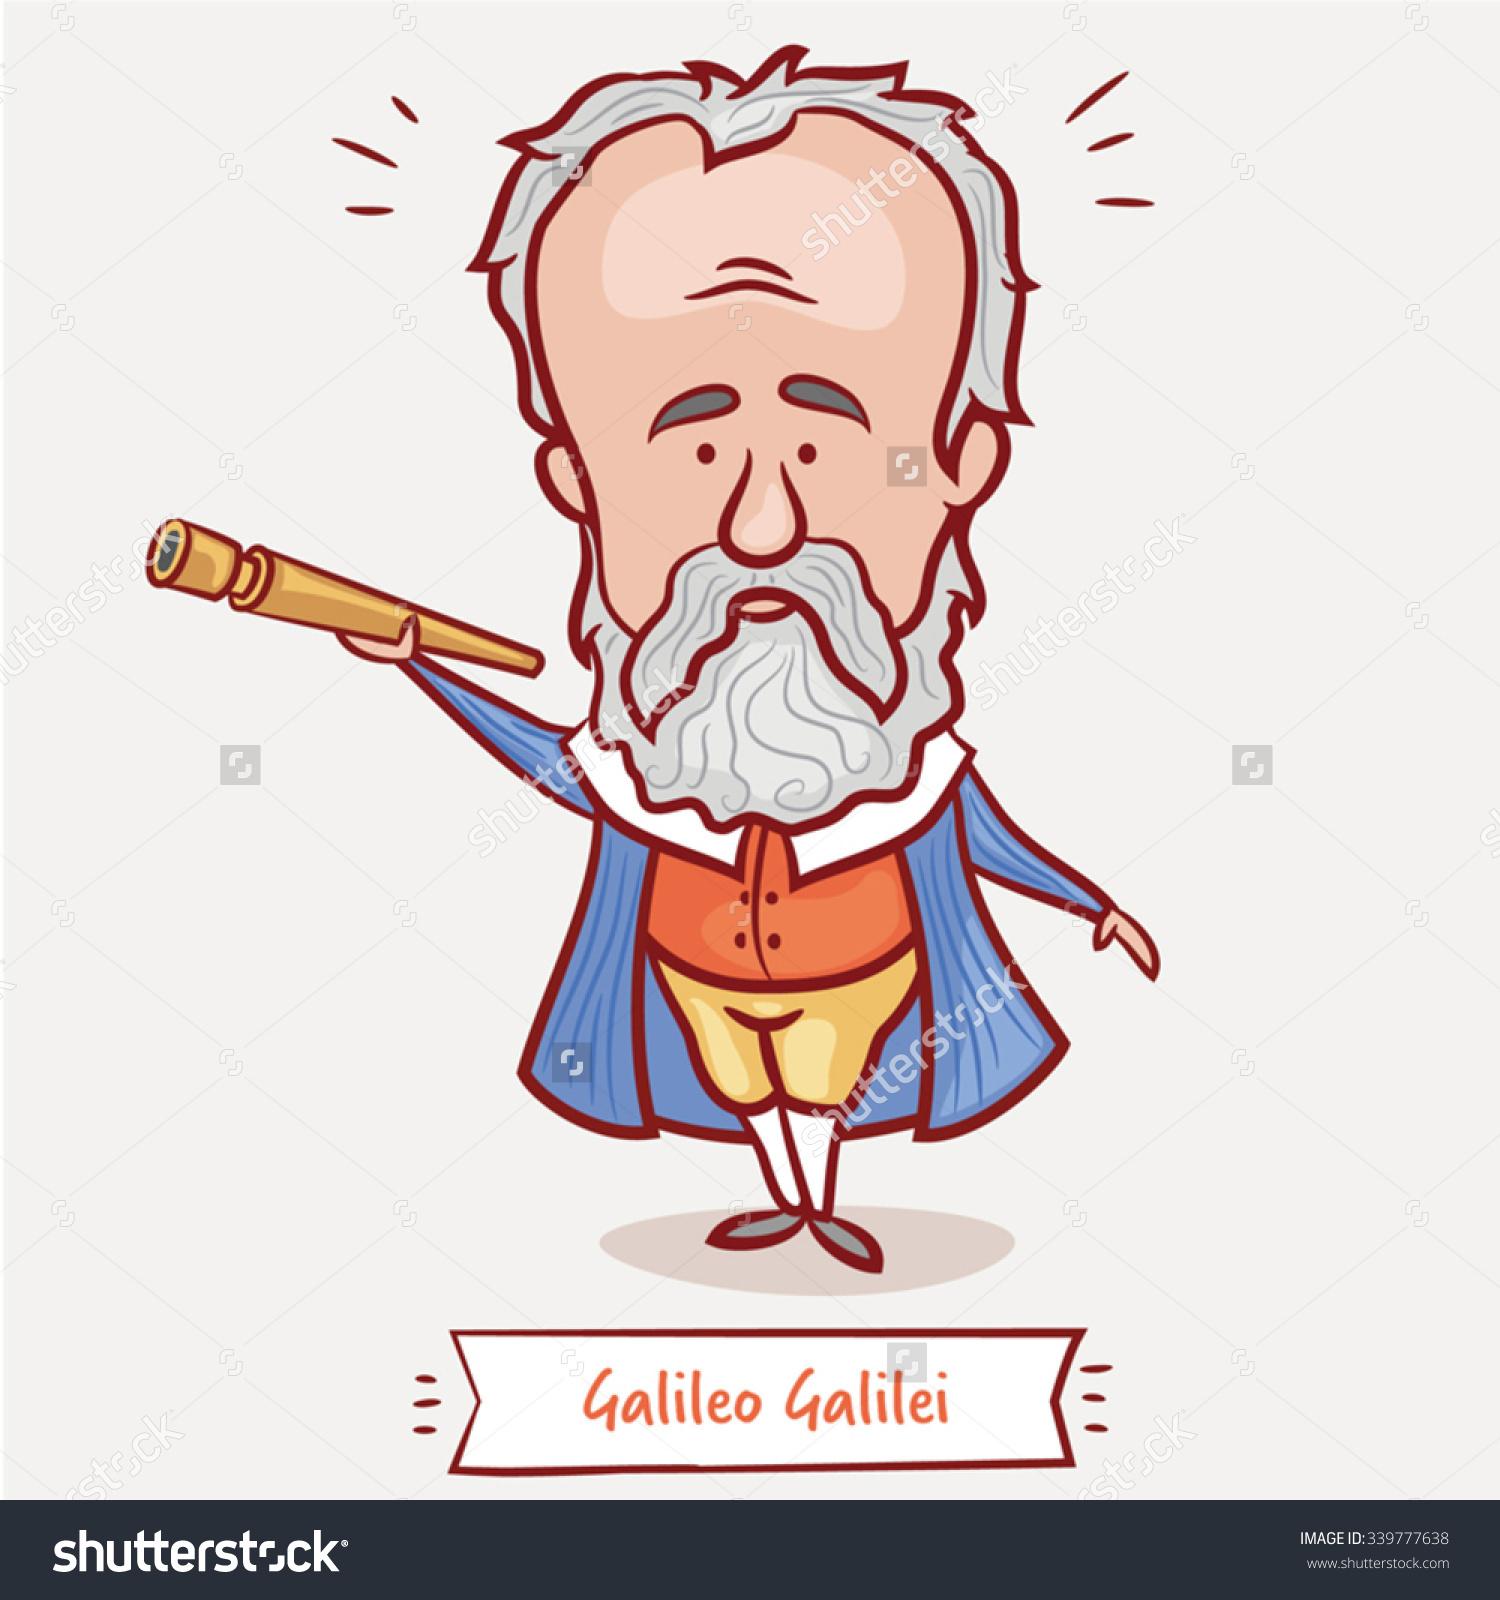 Galileo Galilei Clip Art.